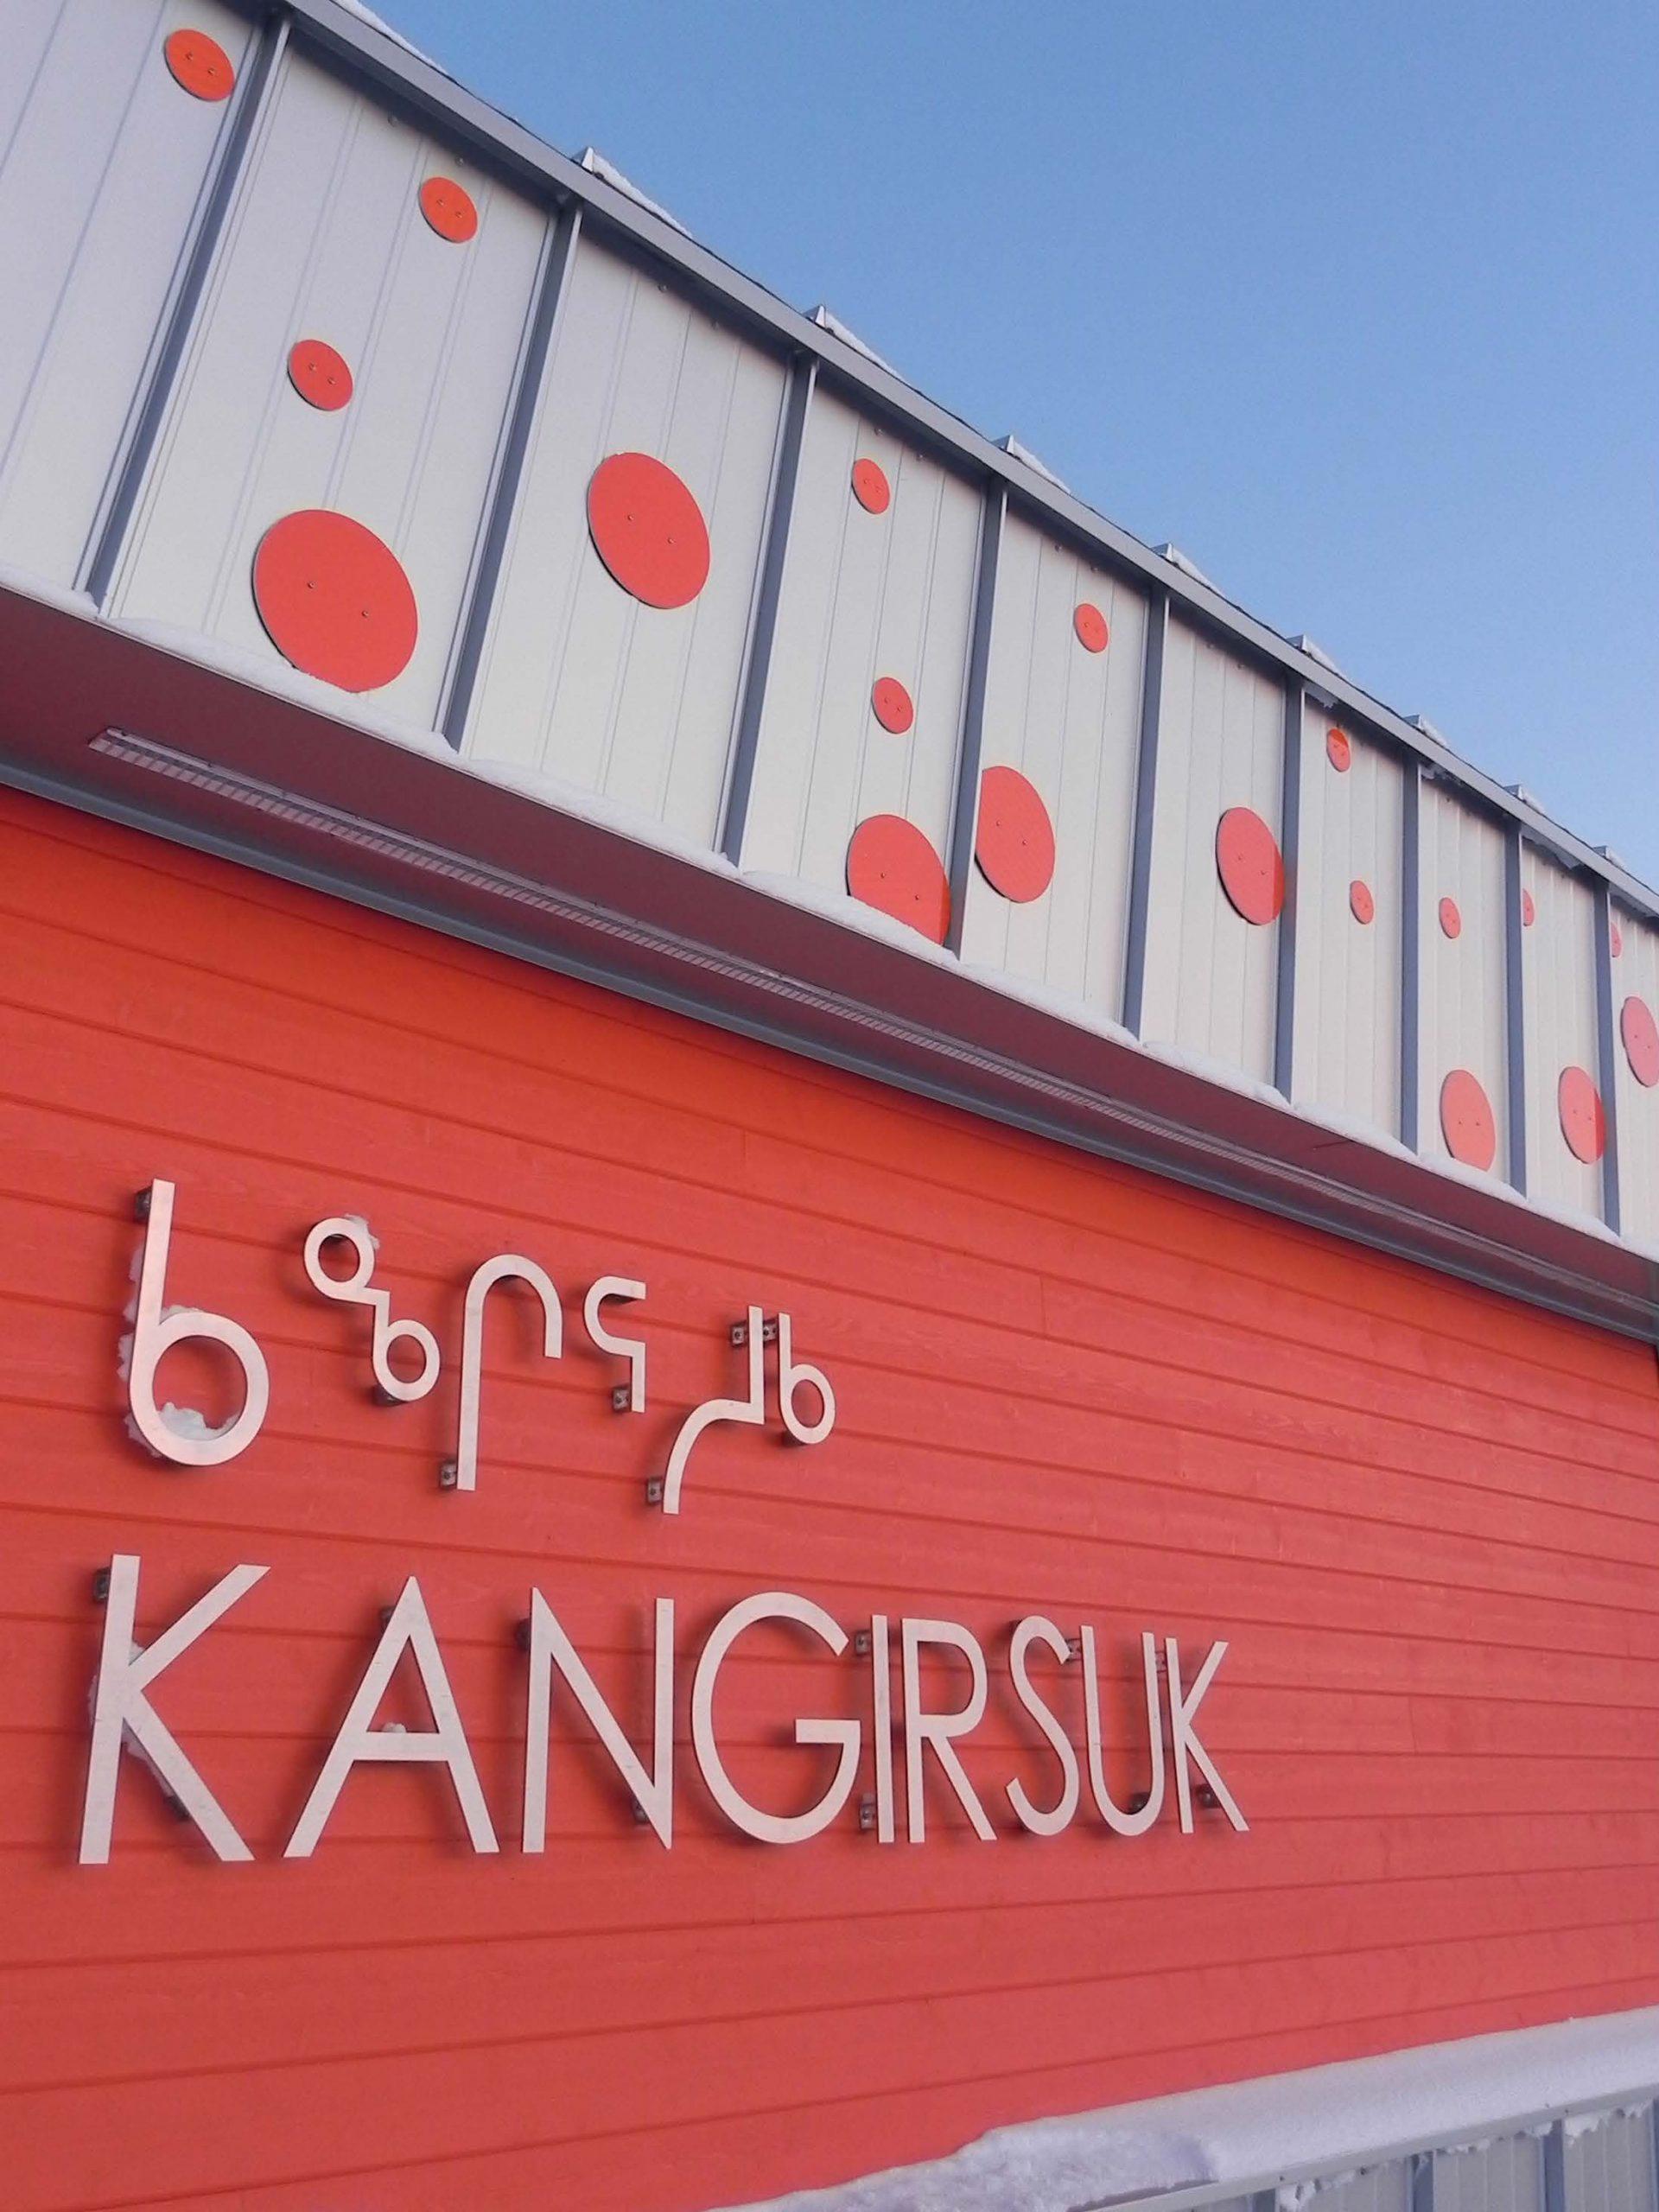 Aérogare de Kangirsuk Cecobois 4